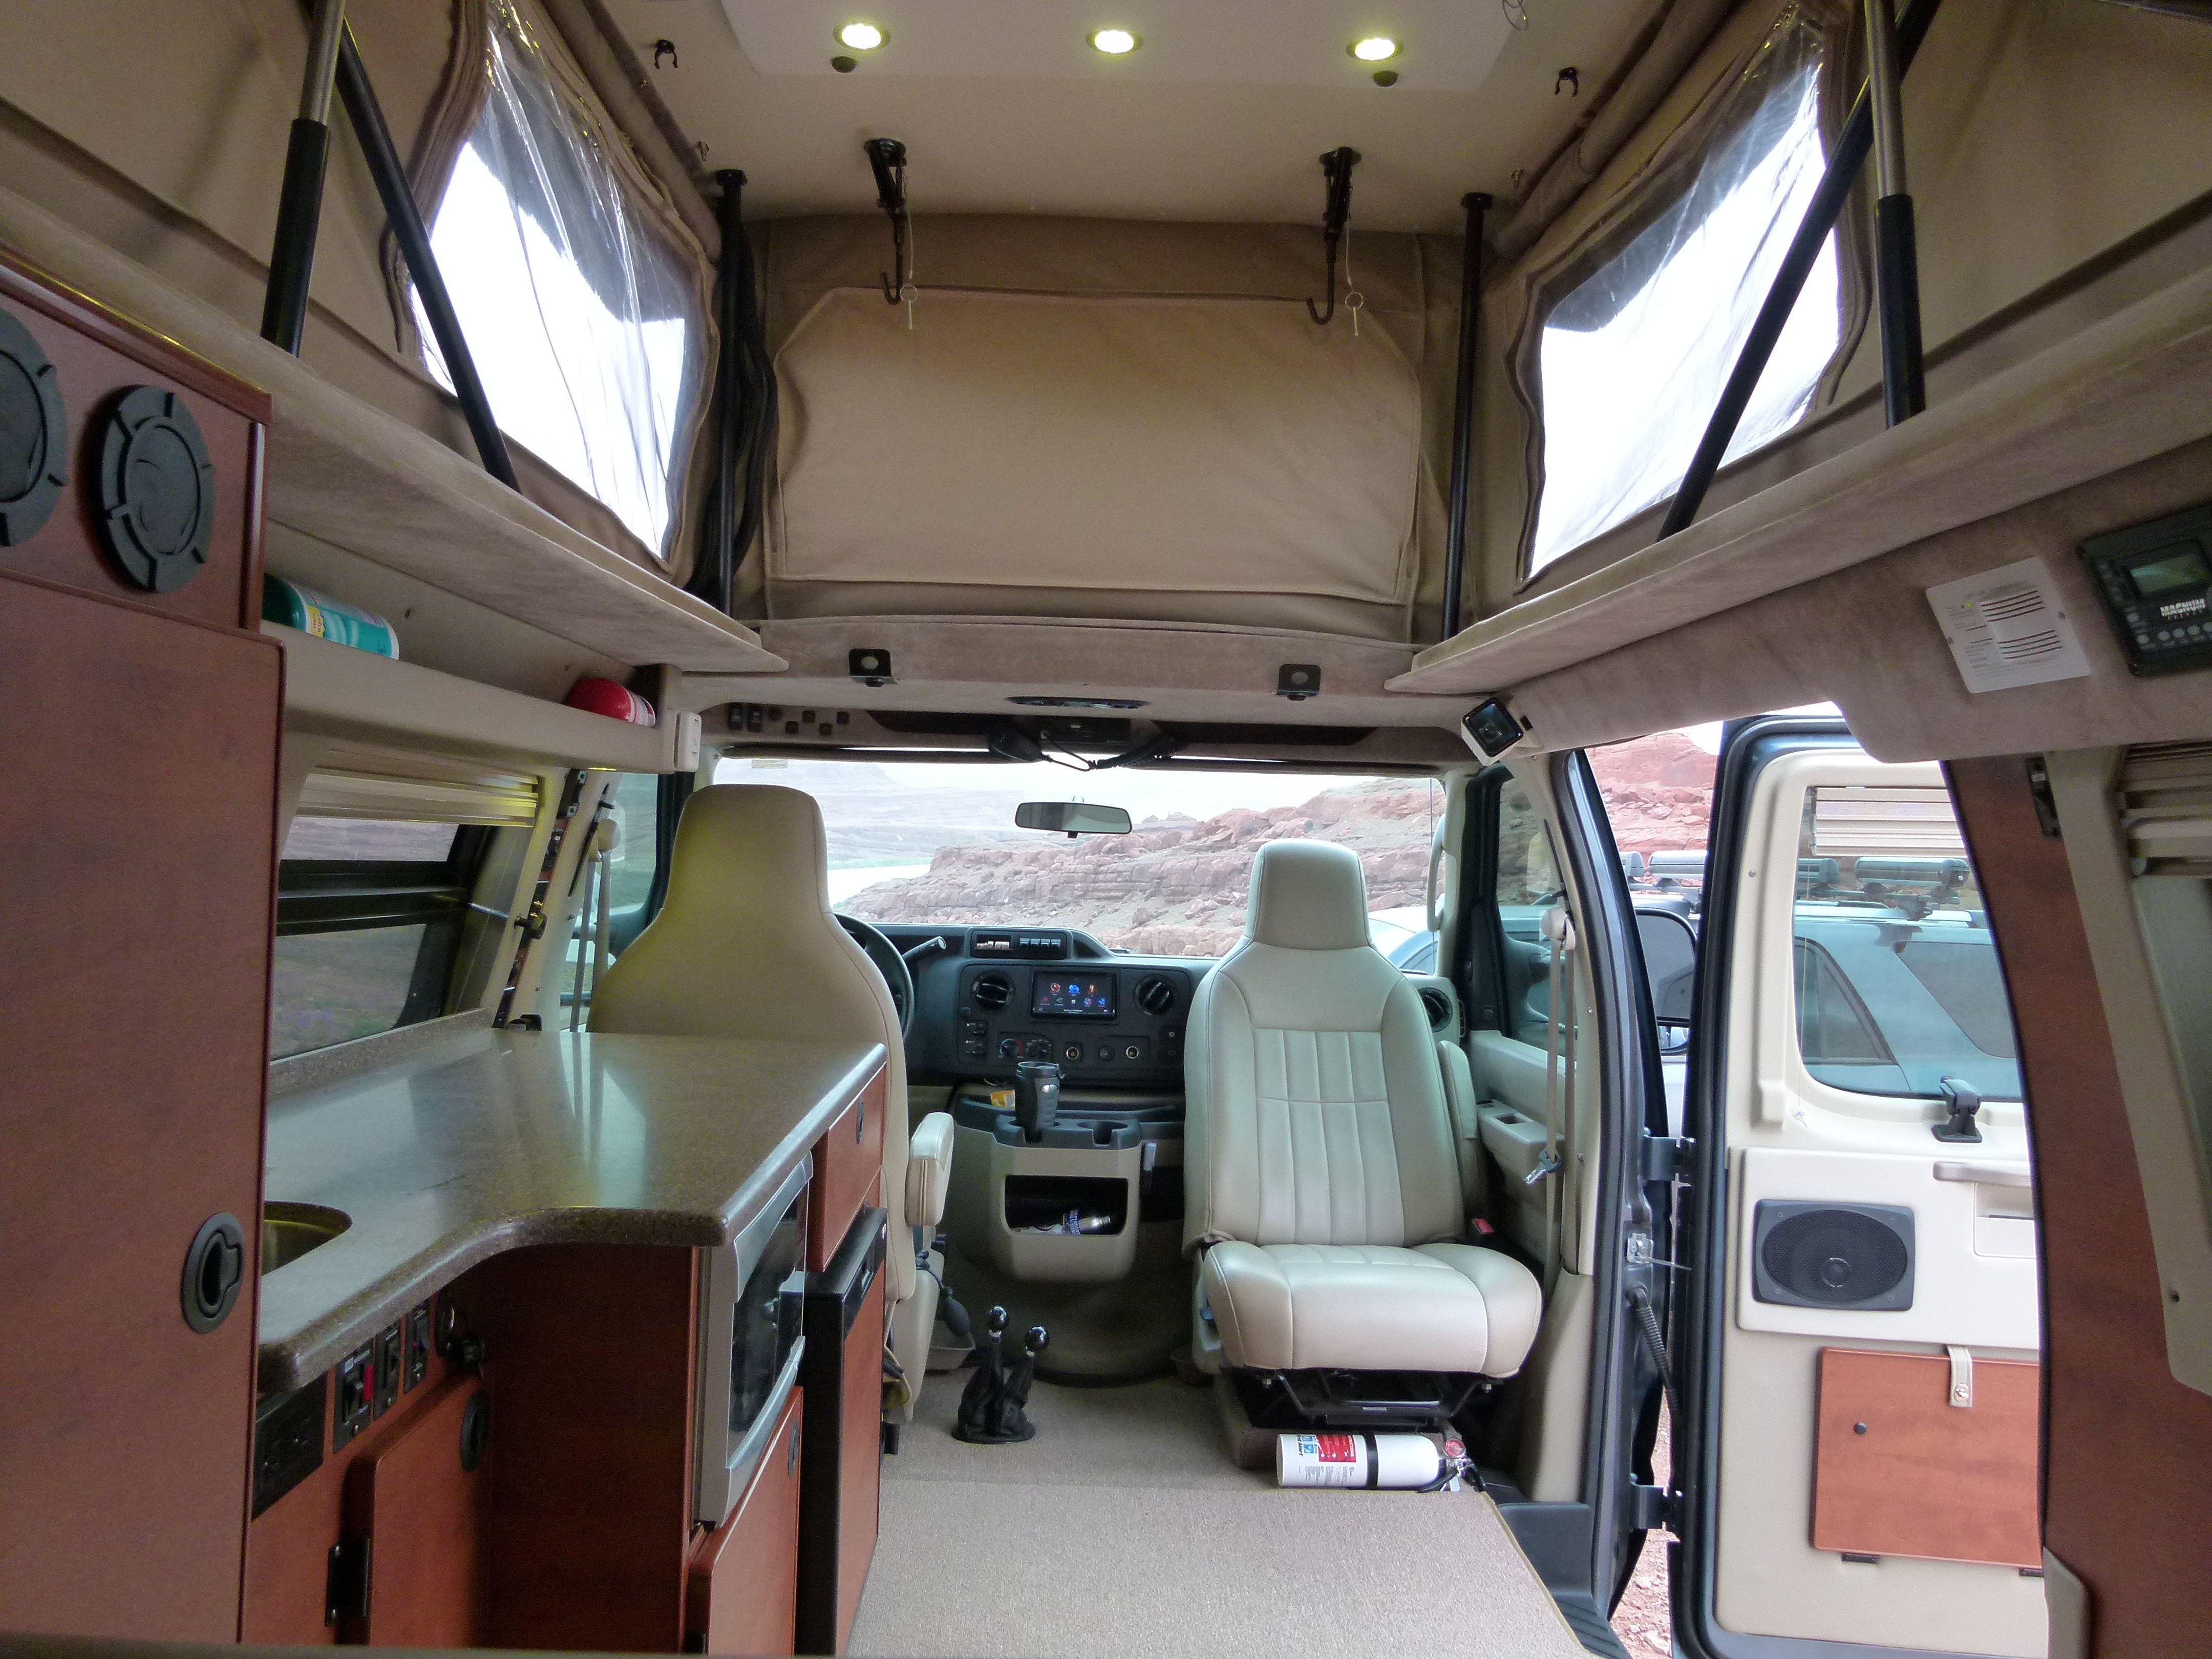 Sportsmobile Interior Adventure Vehicle Rentals Sportsmobile